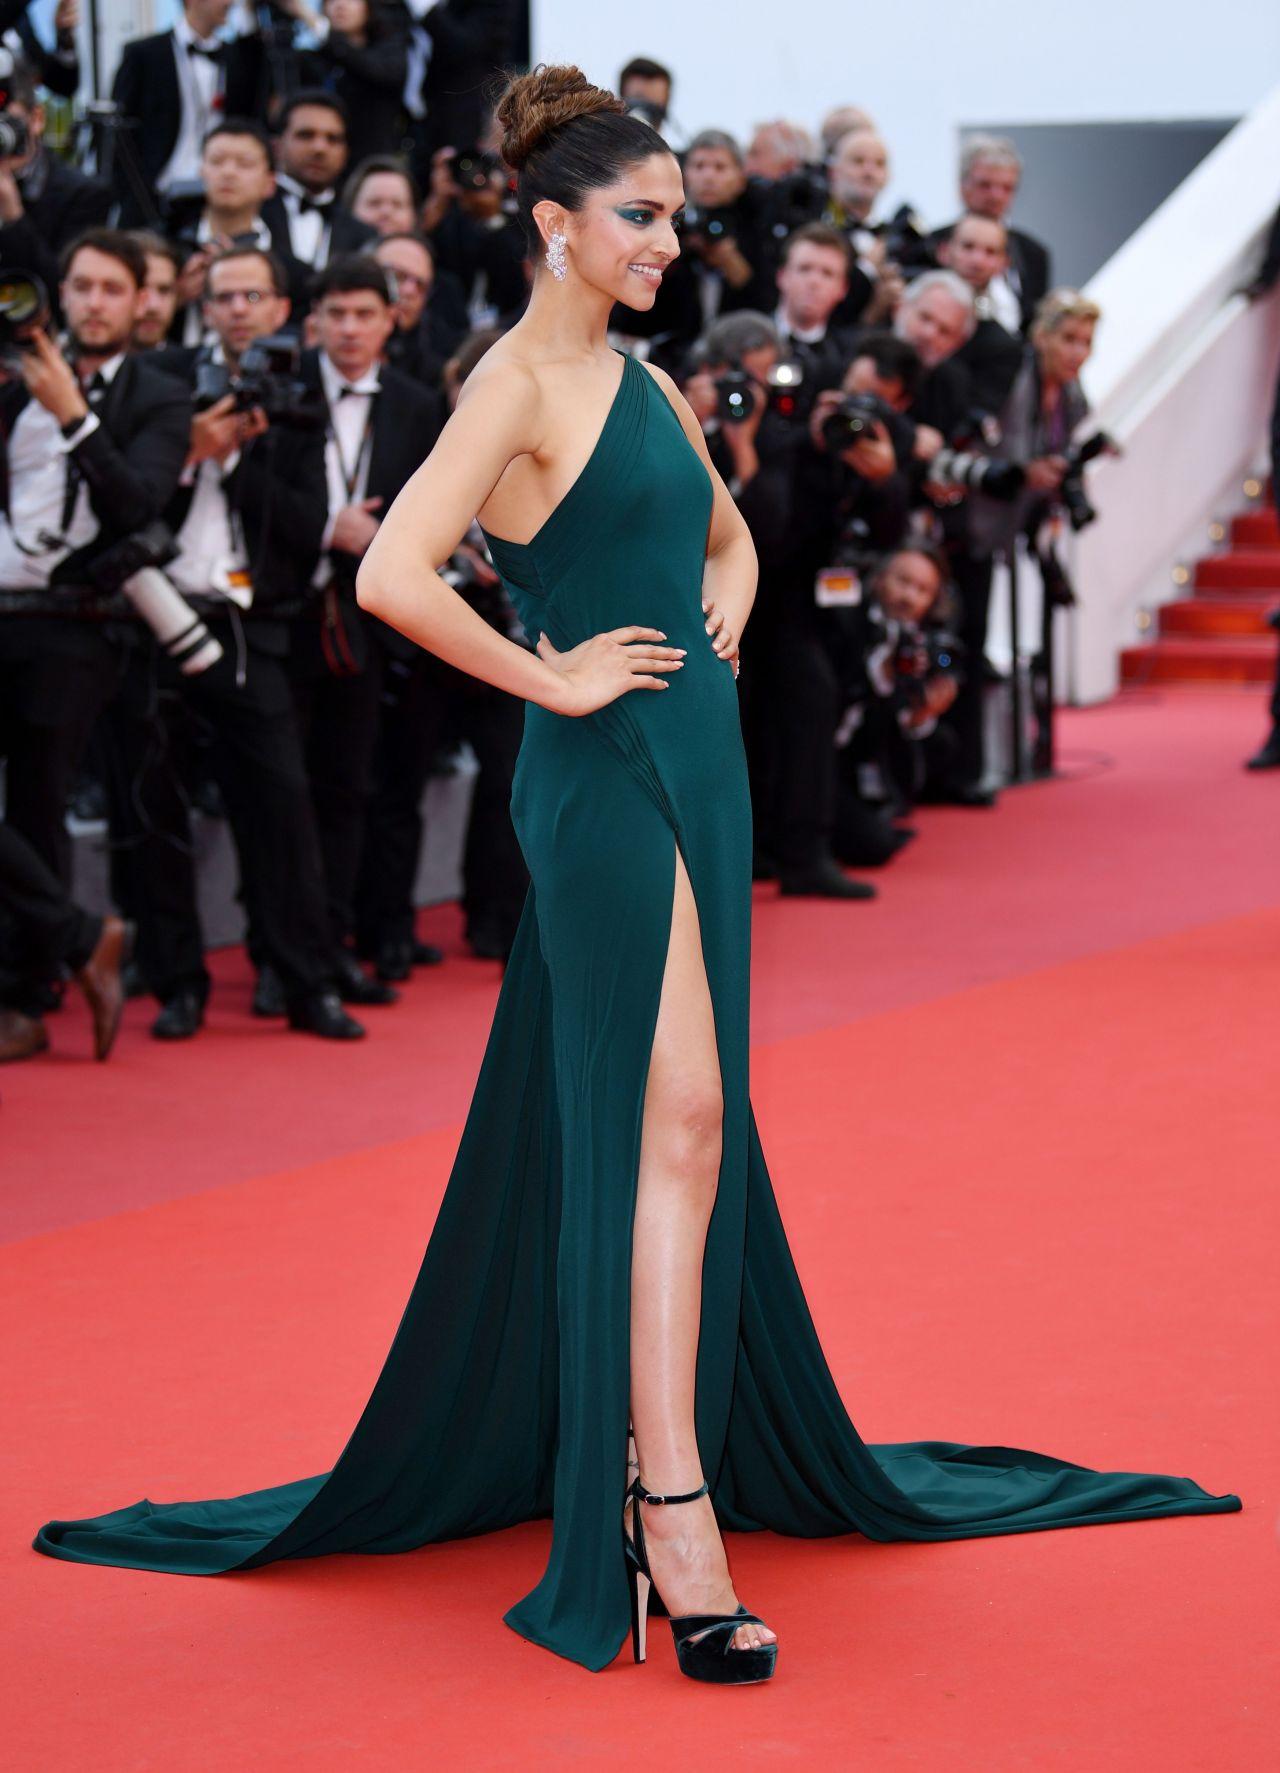 Deepika Padukone Loveless Quot Premiere At Cannes Film